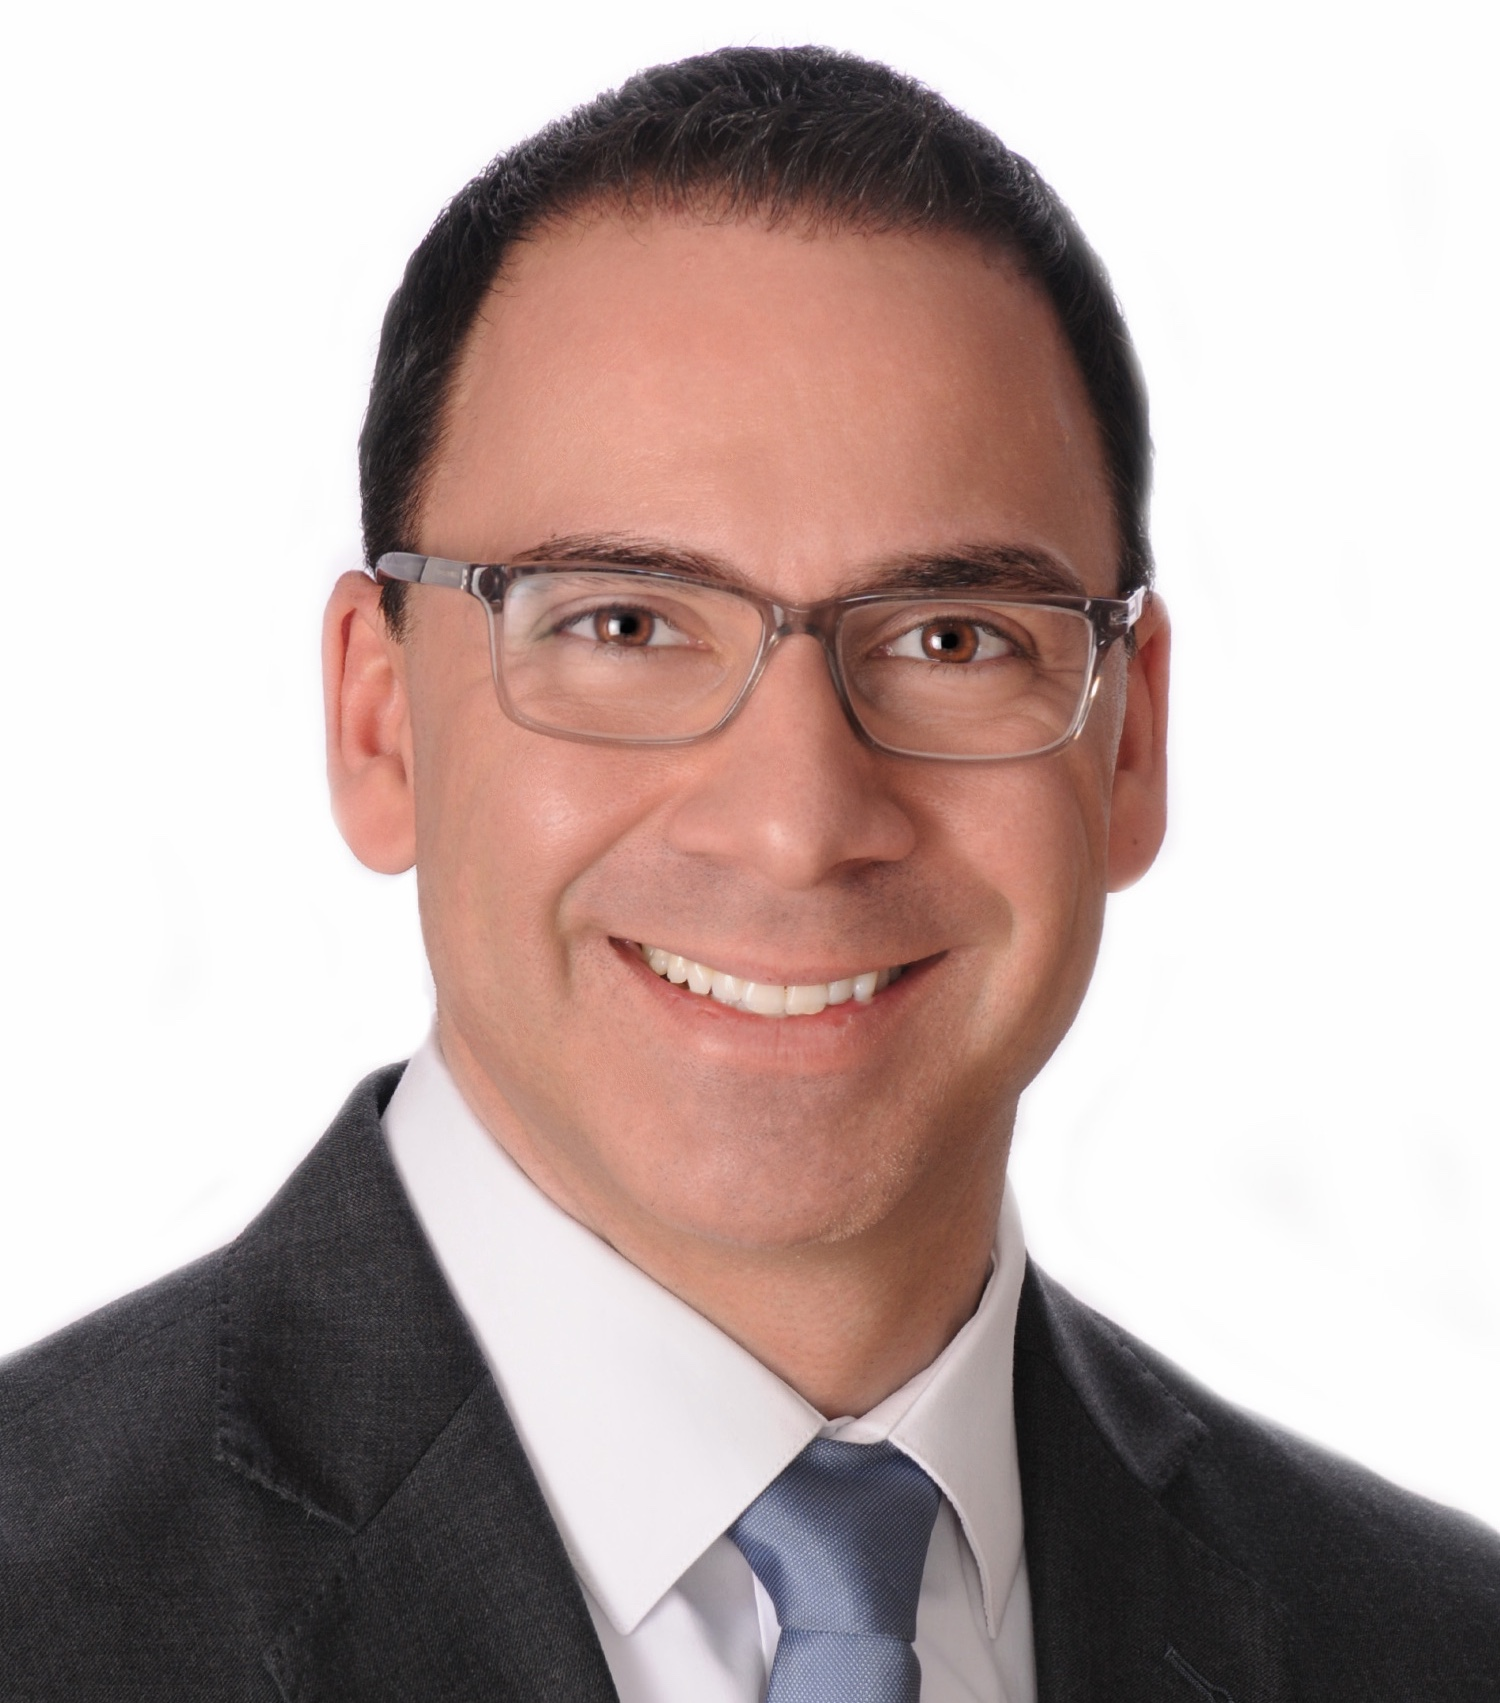 John A. Ternullo